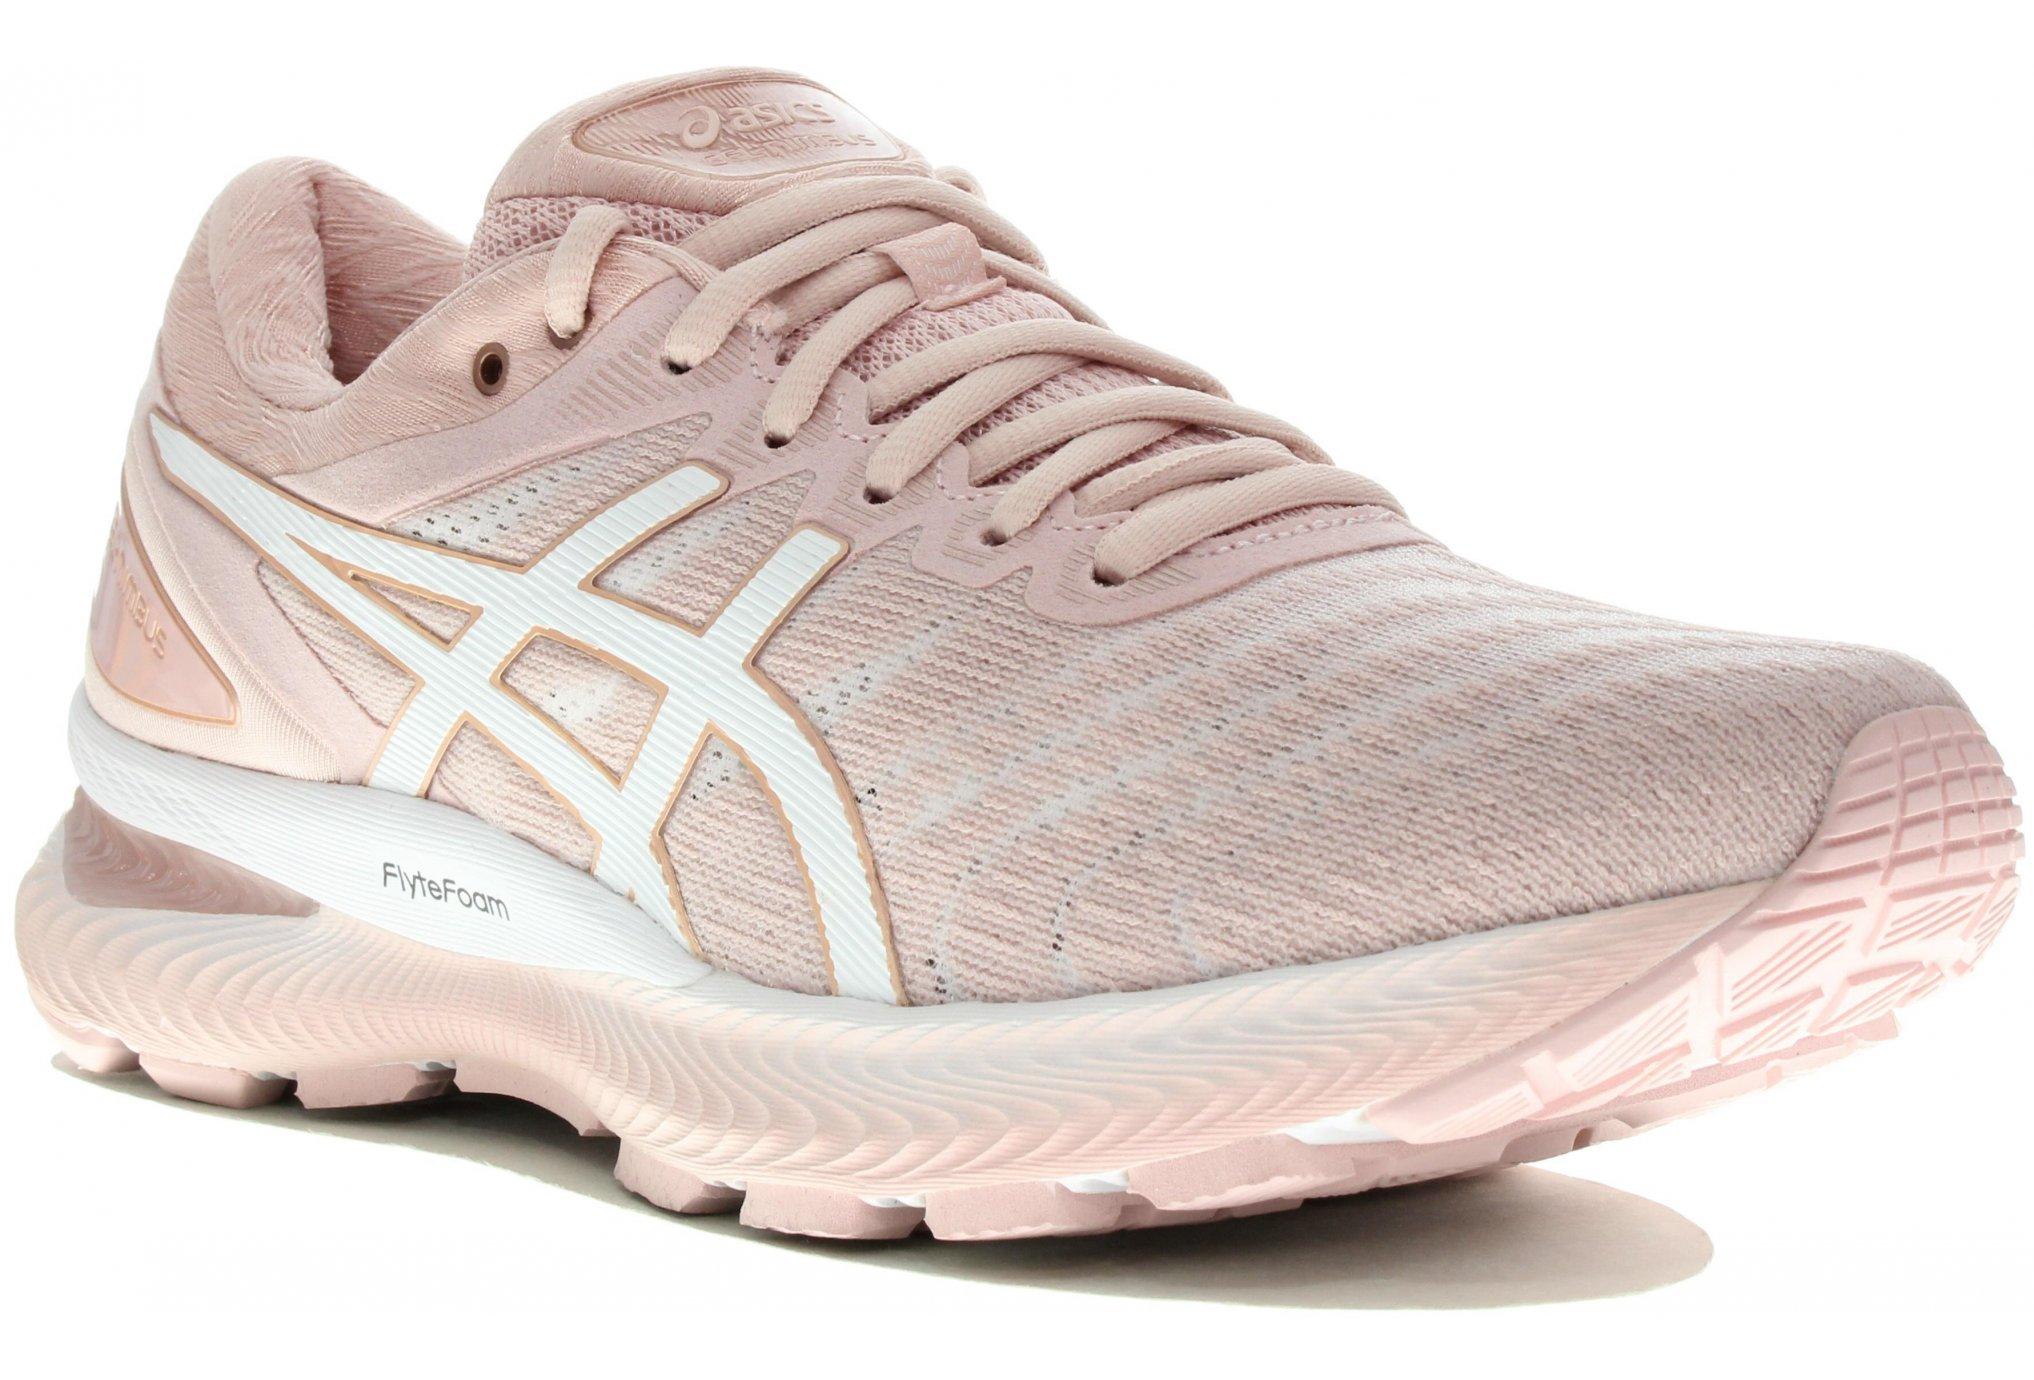 Asics Gel-Nimbus 22 Chaussures running femme